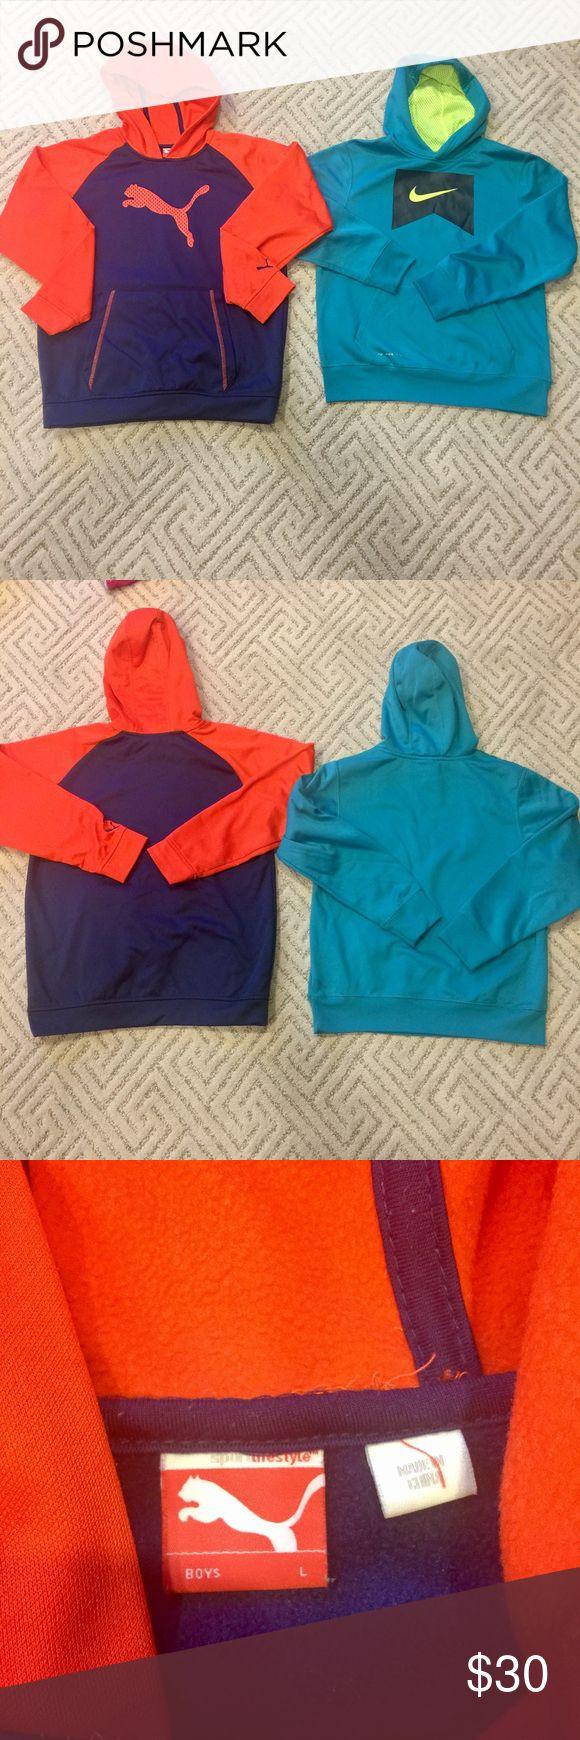 Boys Nike & Puma Hoodies sweatshirts in L size Boys Nike & Puma Hoodies sweatshirts in L size, still in good condition. Nike & Puma Shirts & Tops Sweatshirts & Hoodies